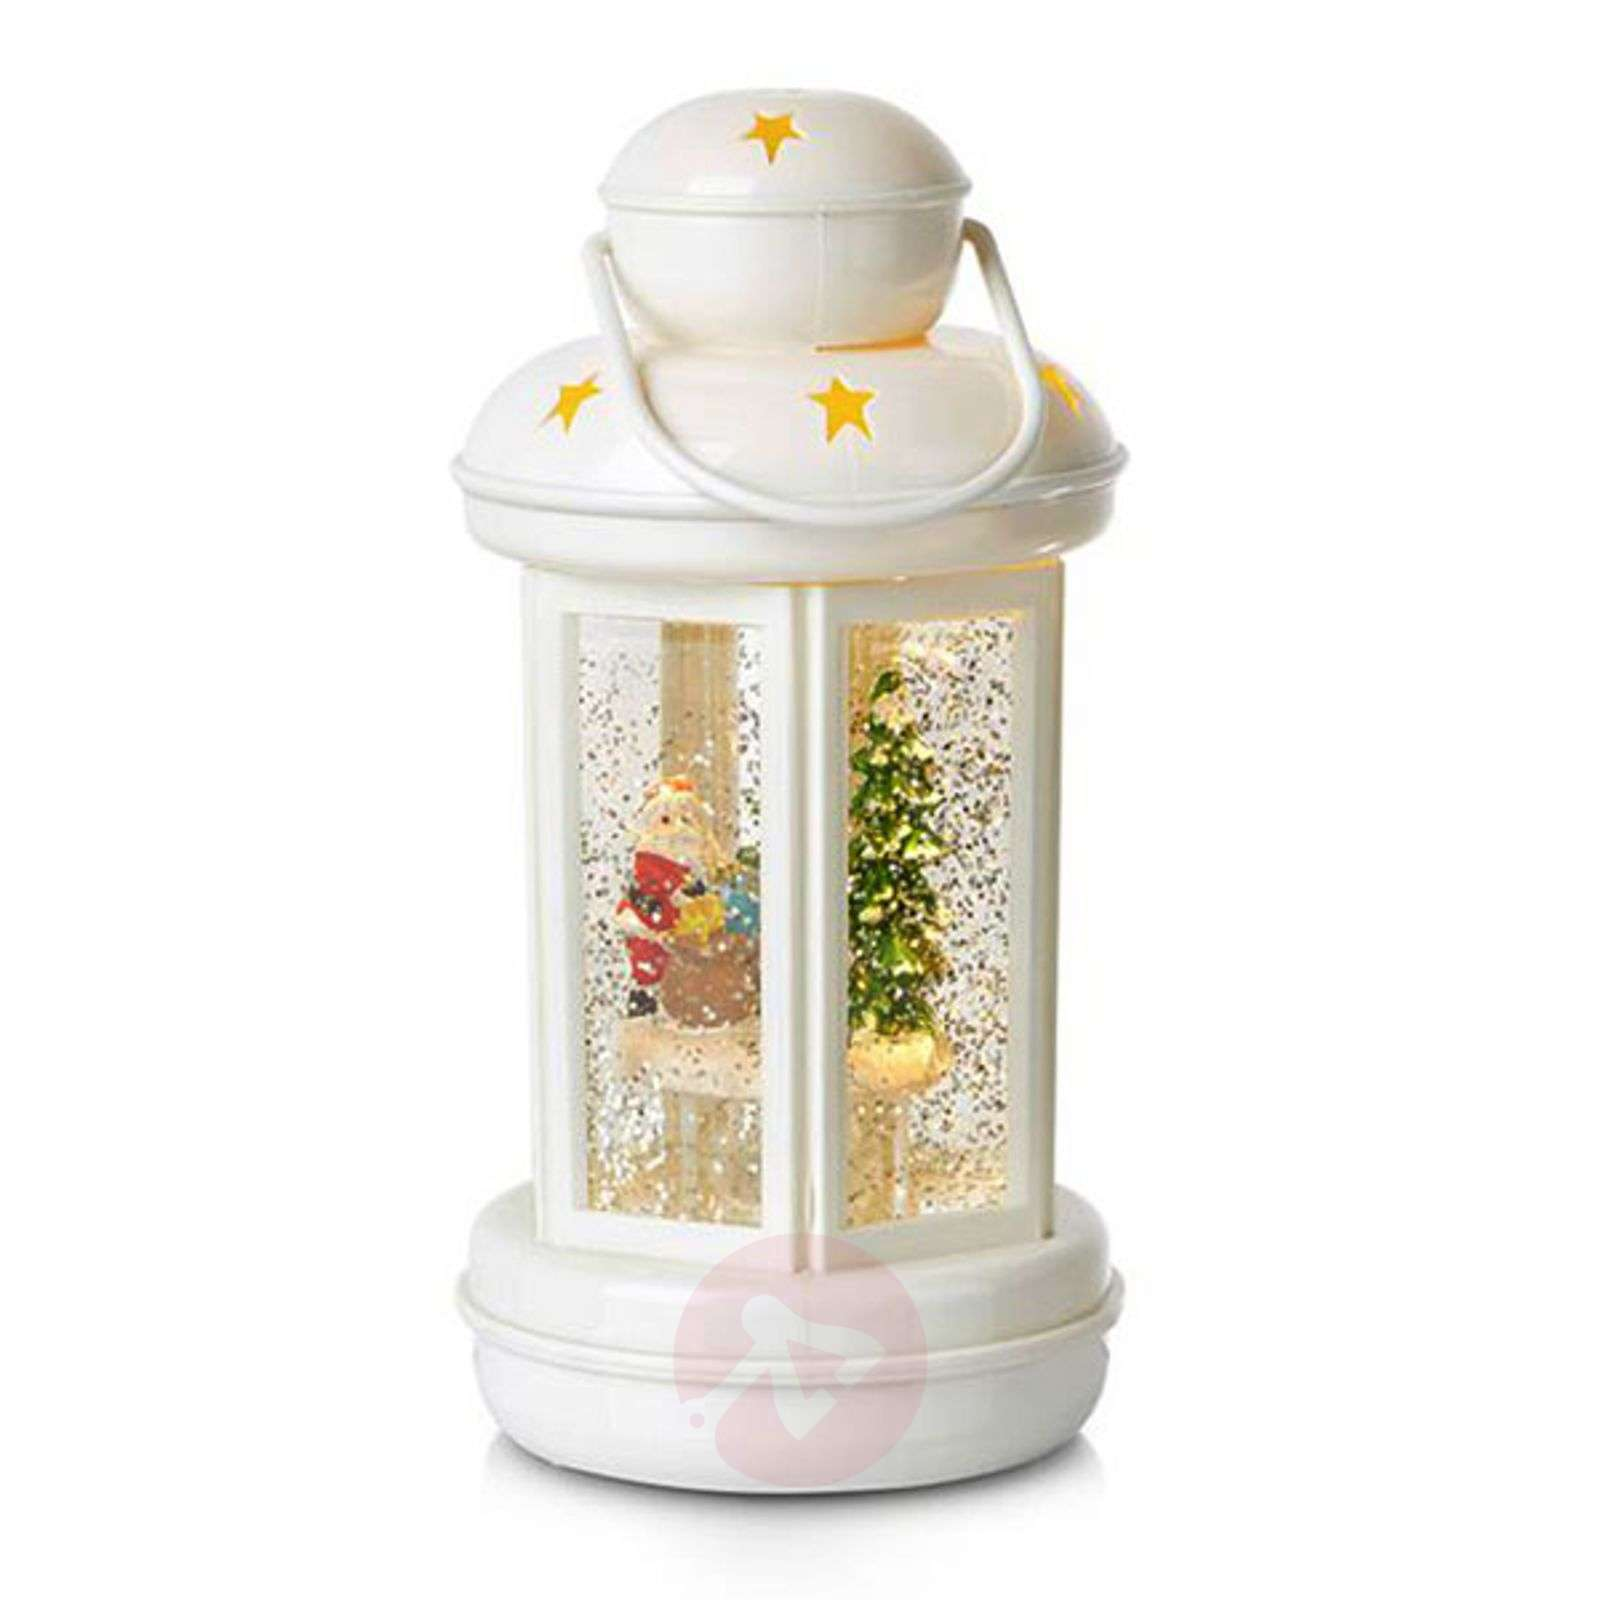 Glitter-filled decorative lantern Cosy LED-6507510X-01